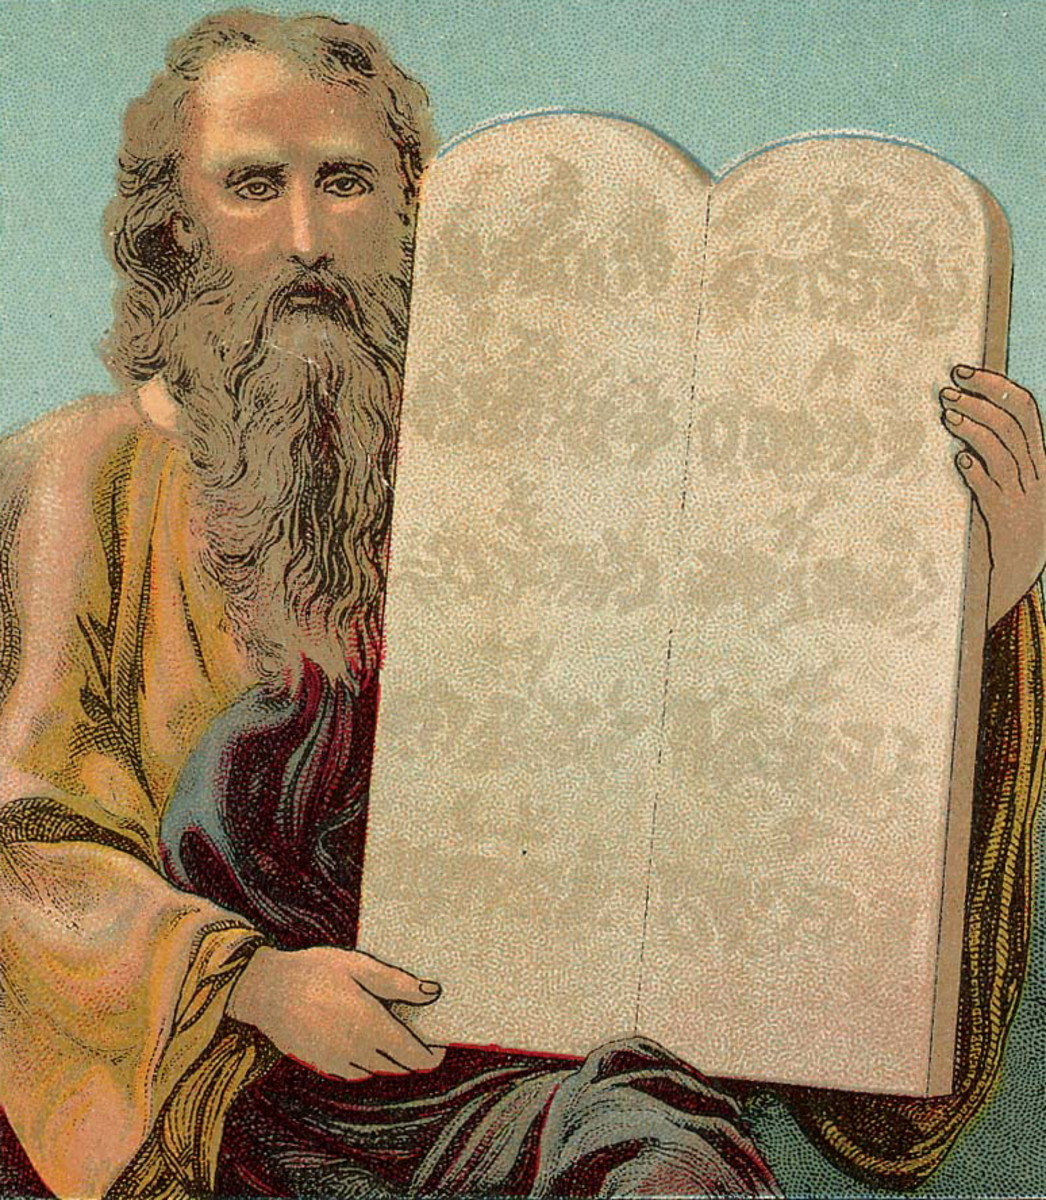 sabbath-day-observance-an-outward-expression-of-an-inner-belief